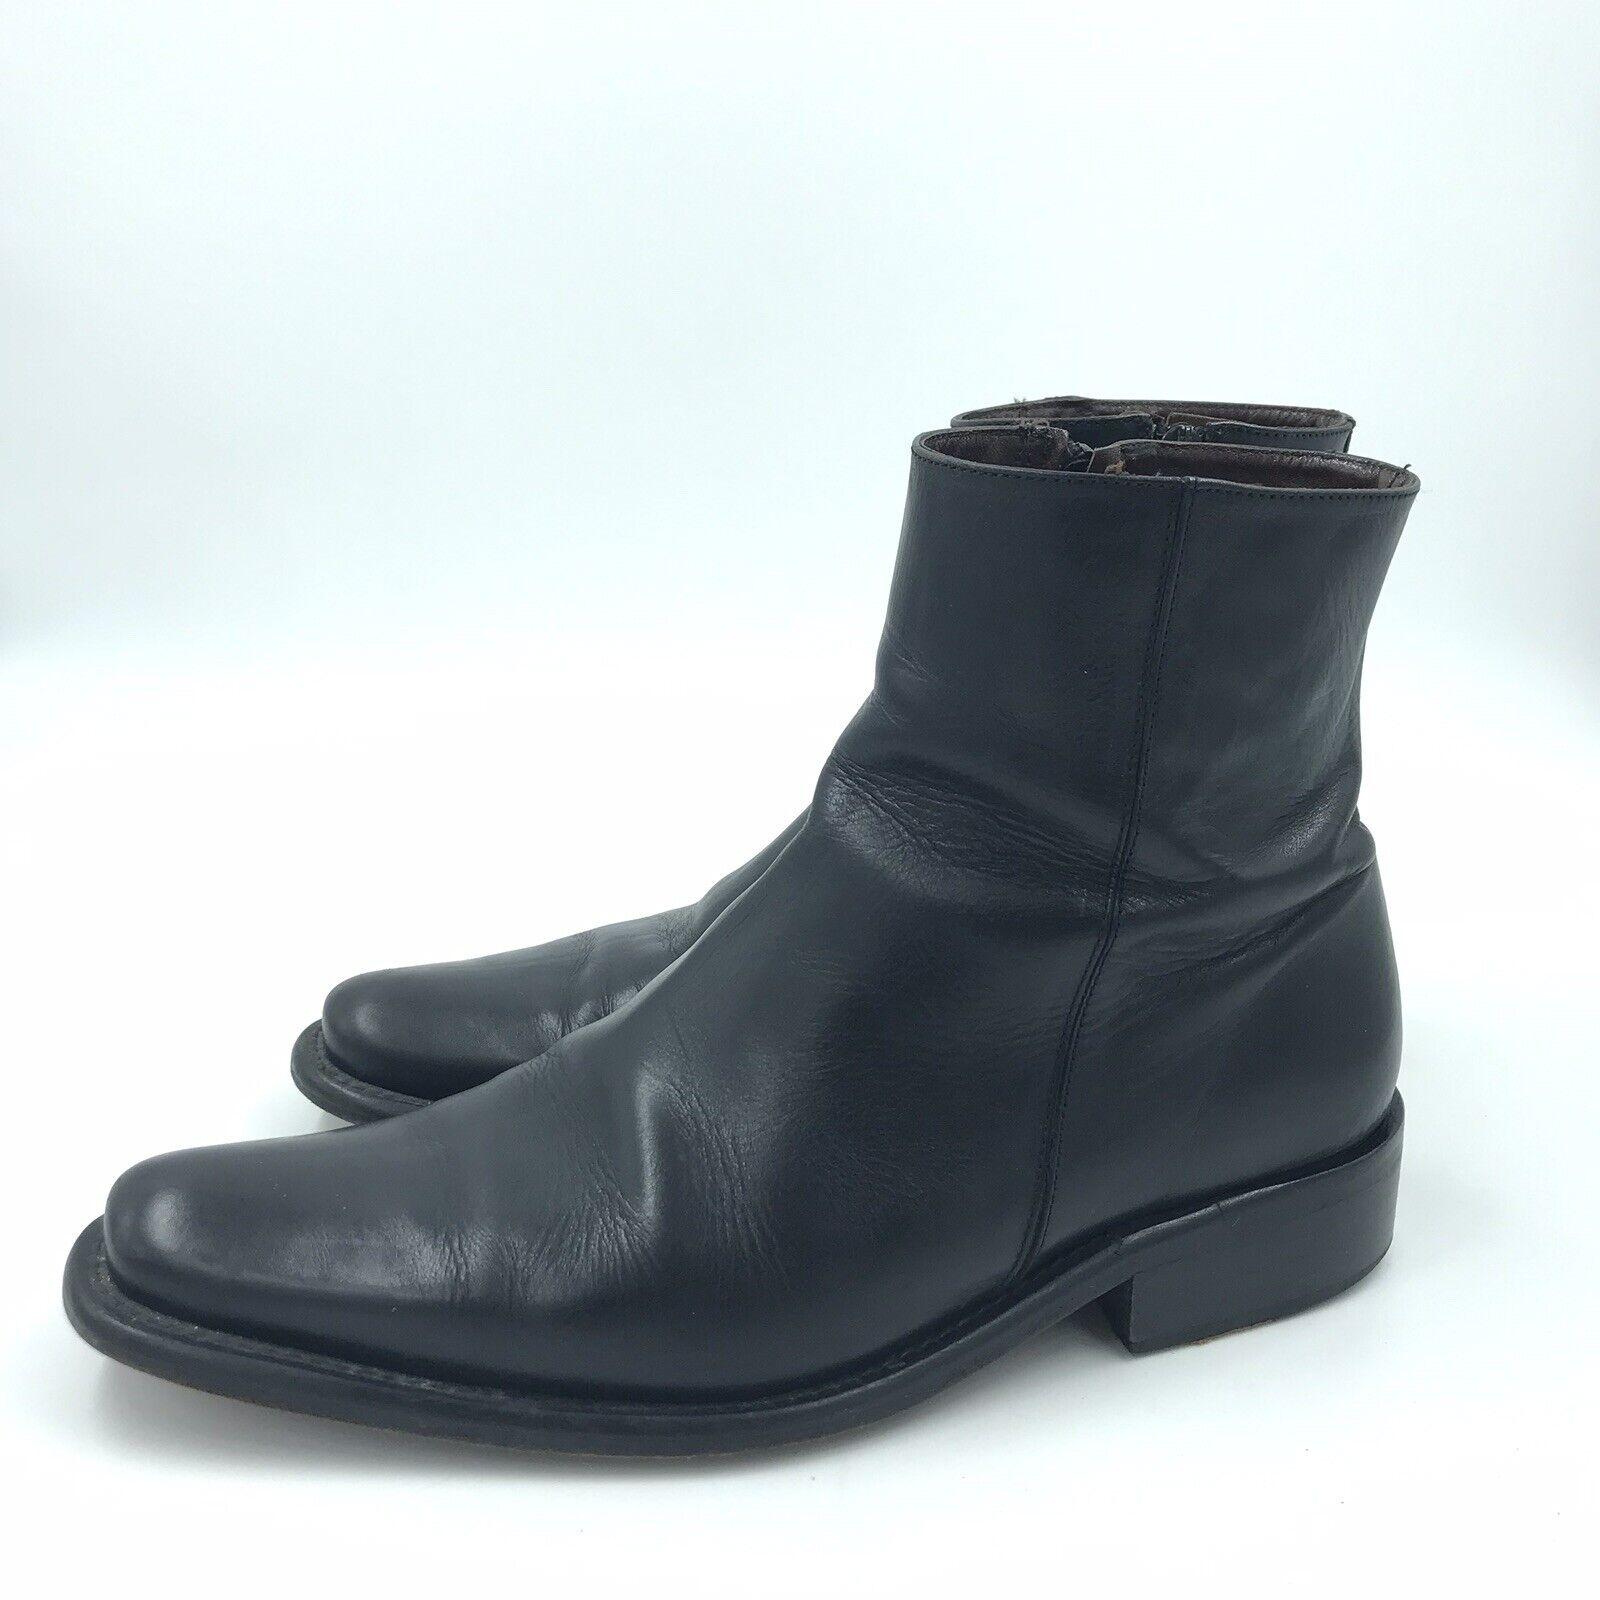 Martinelli Mens Leather Boots Sz 42C Soft Black Made in Spain U.S. Sz 9 Zipper